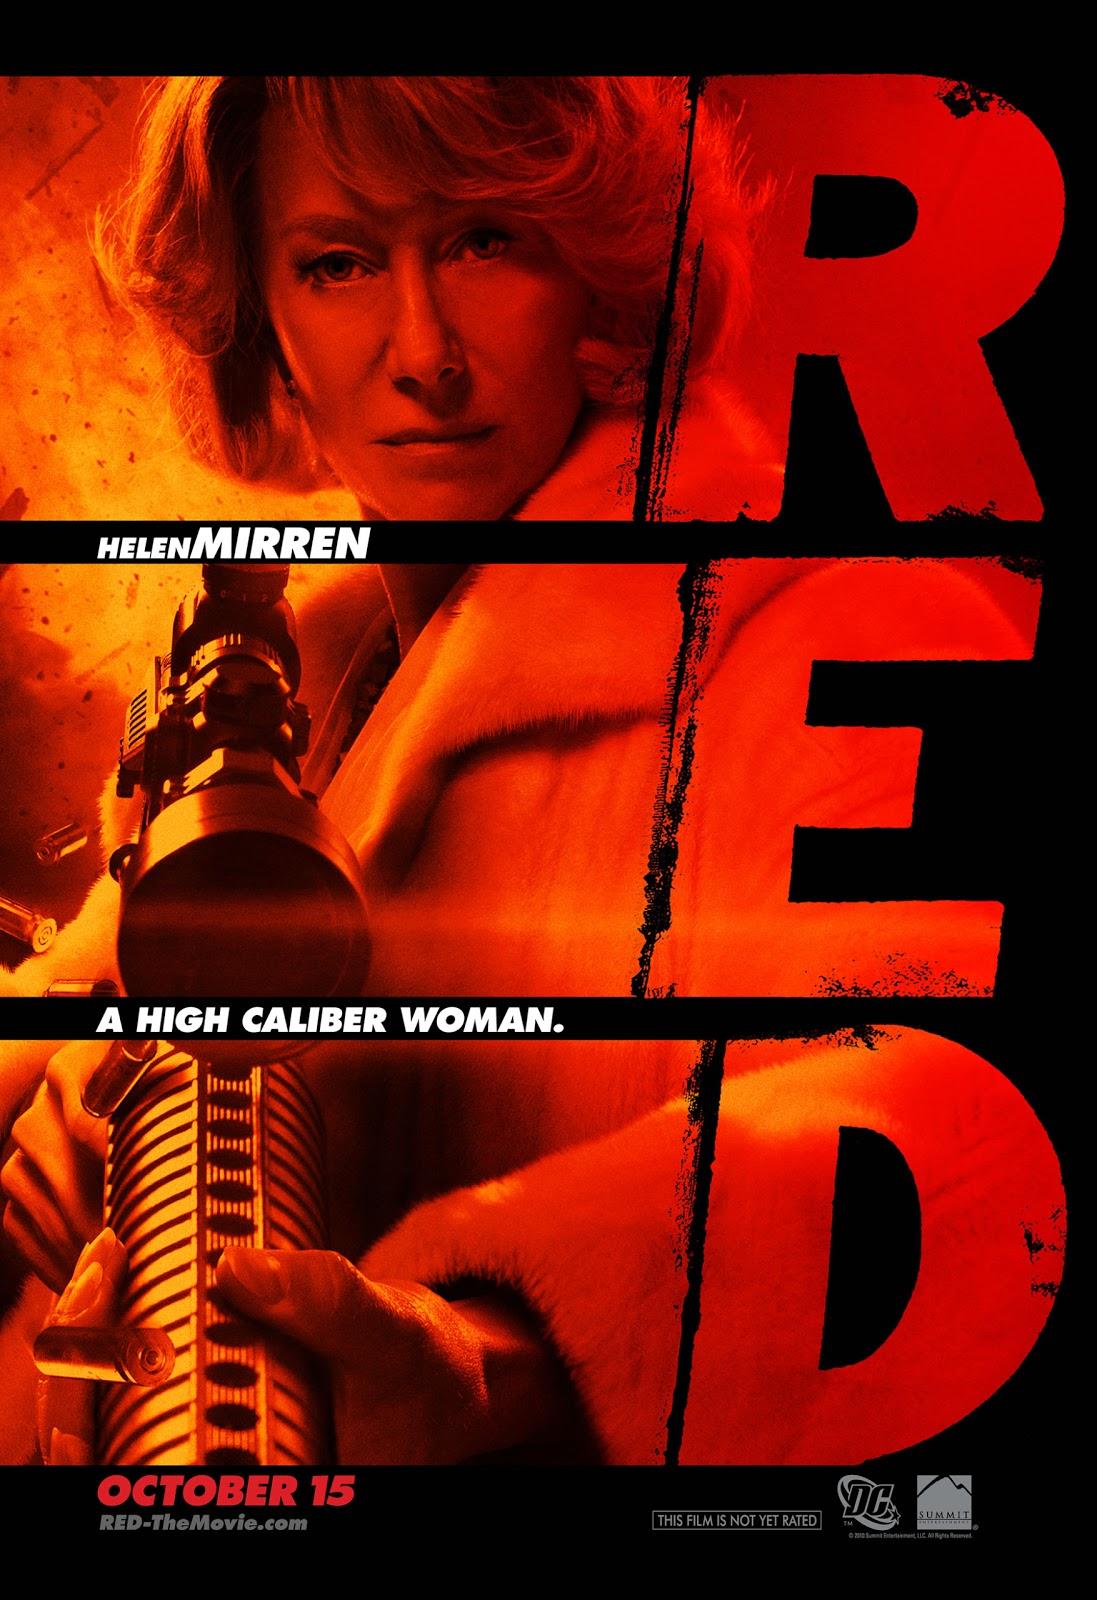 http://3.bp.blogspot.com/_q1zFTmkPT1I/TKOBPgGYpsI/AAAAAAAABD0/89oqcJJQAaA/s1600/Red-Helen-Mirren-Poster.jpg